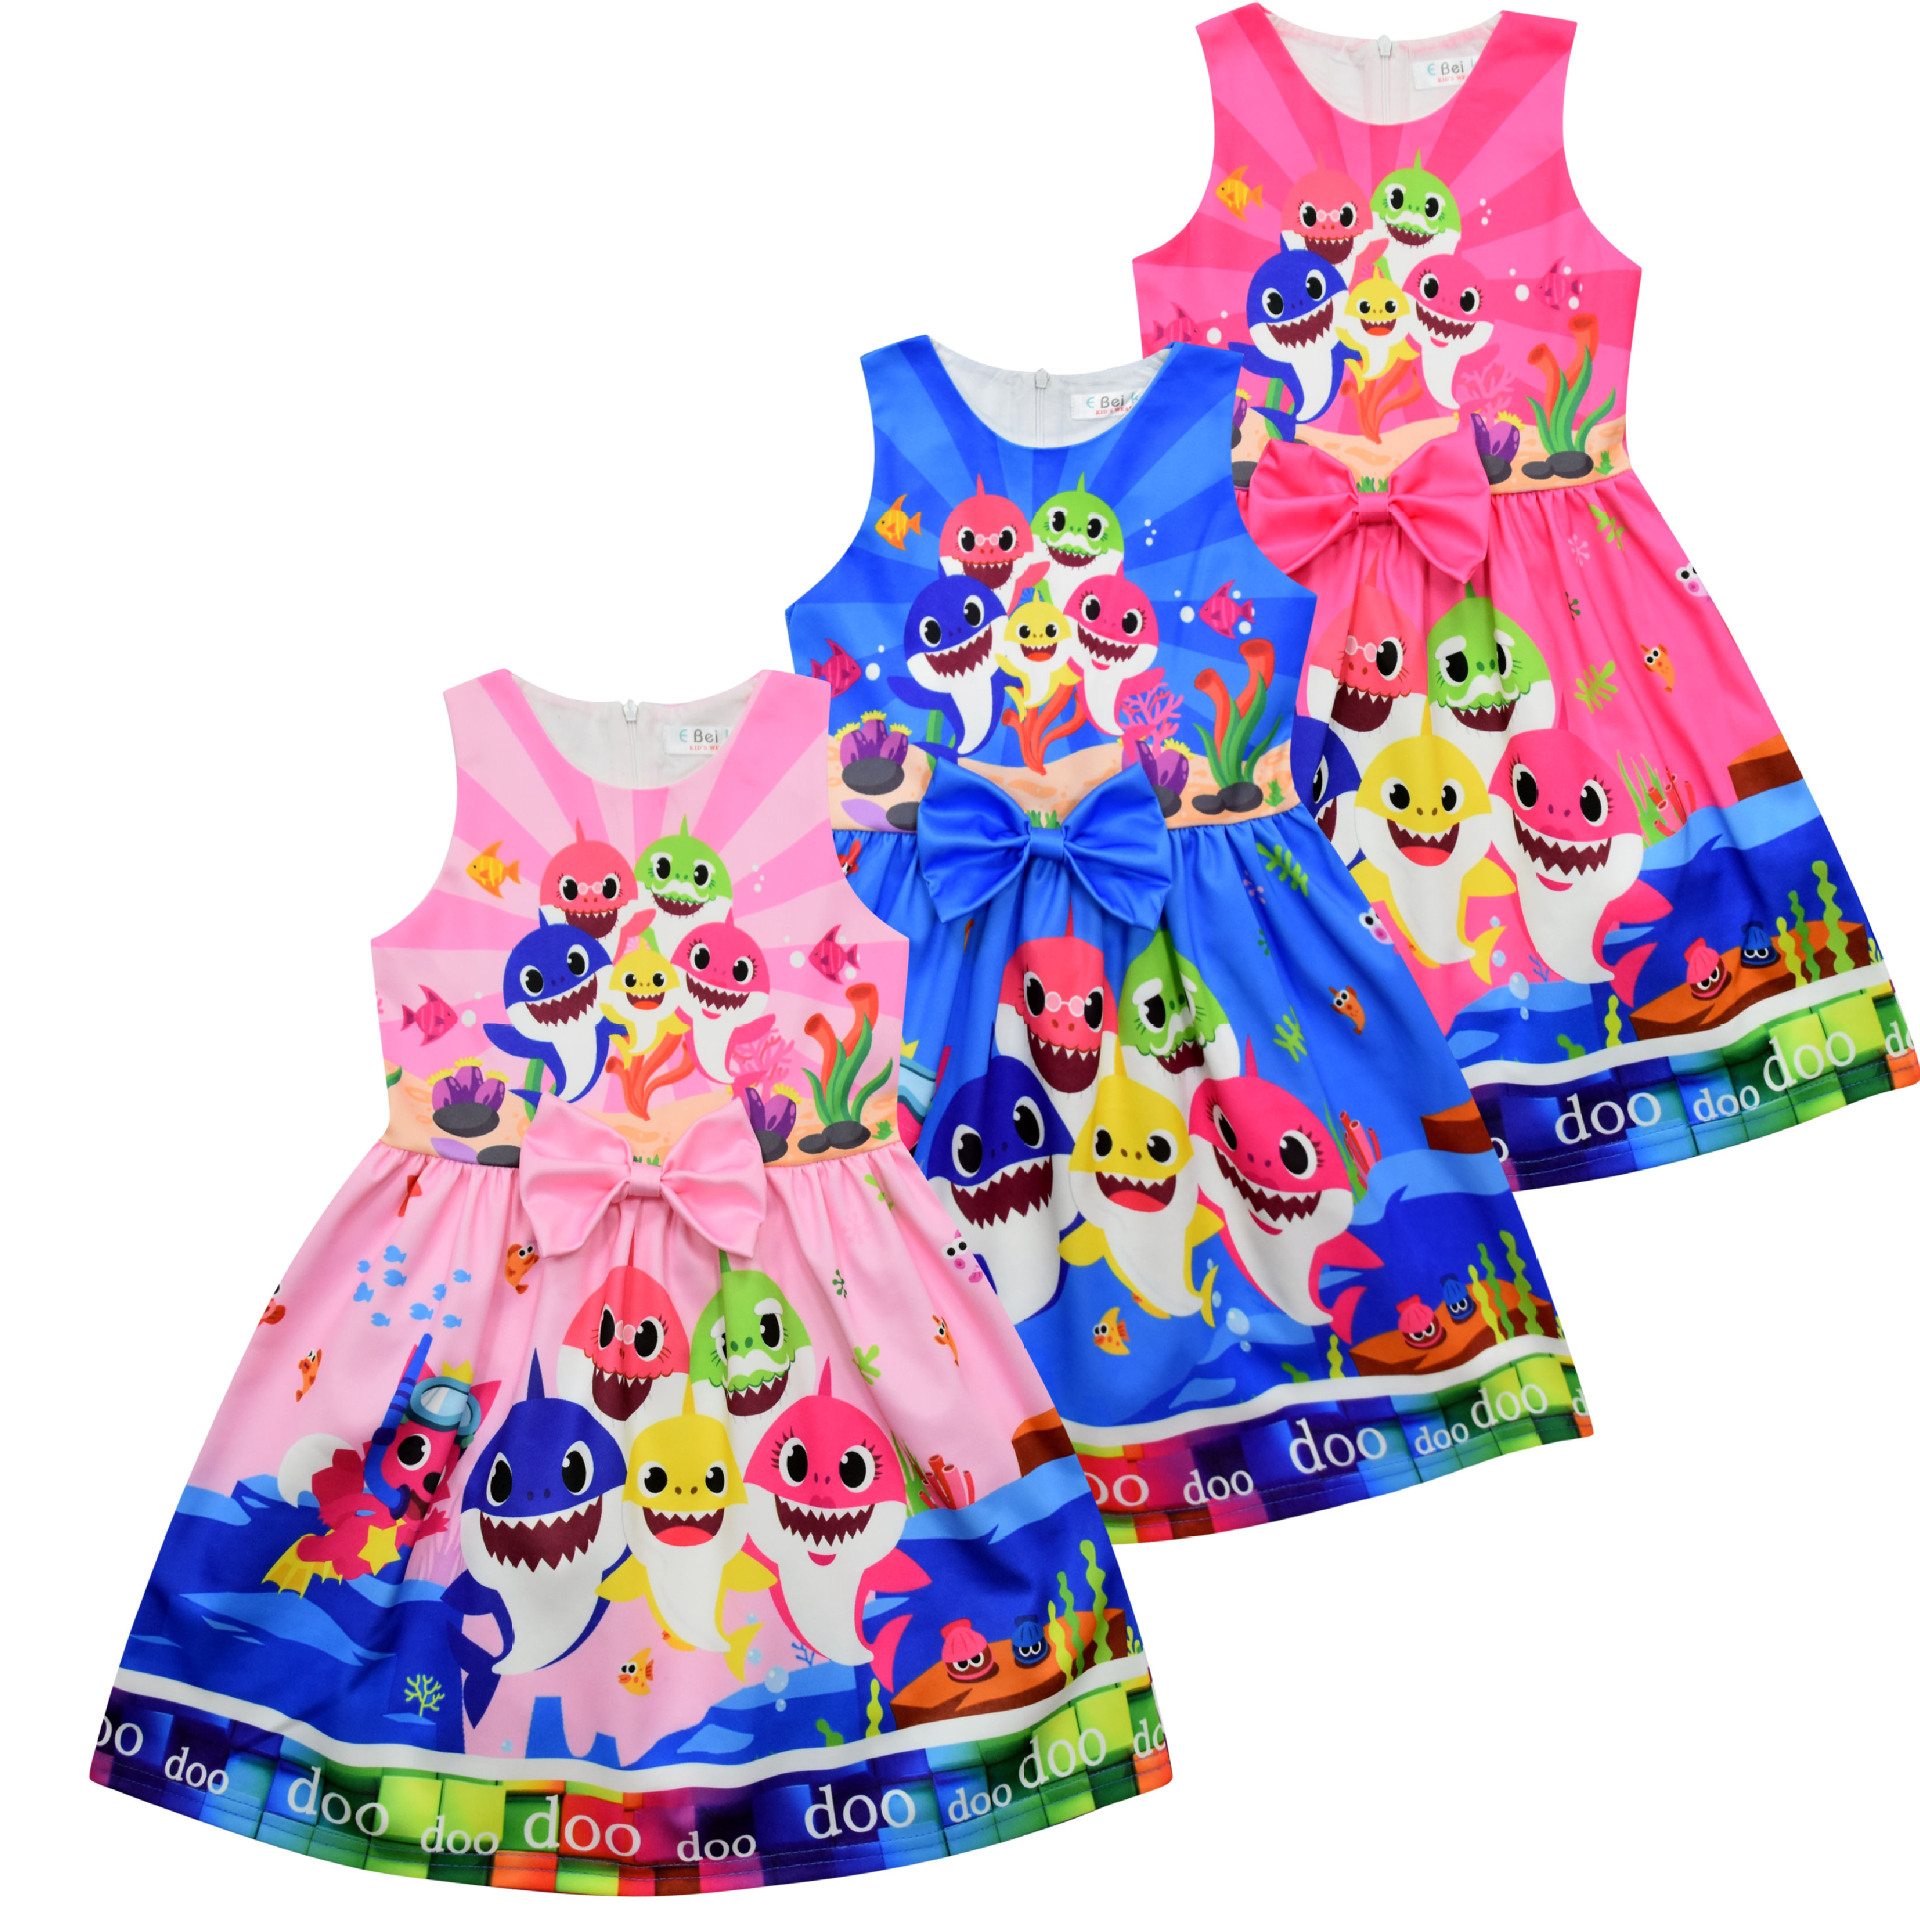 New Summer Surprise Girl Princess Dress Cute Cartoon Unicorn Party Dress Children Clothing 5